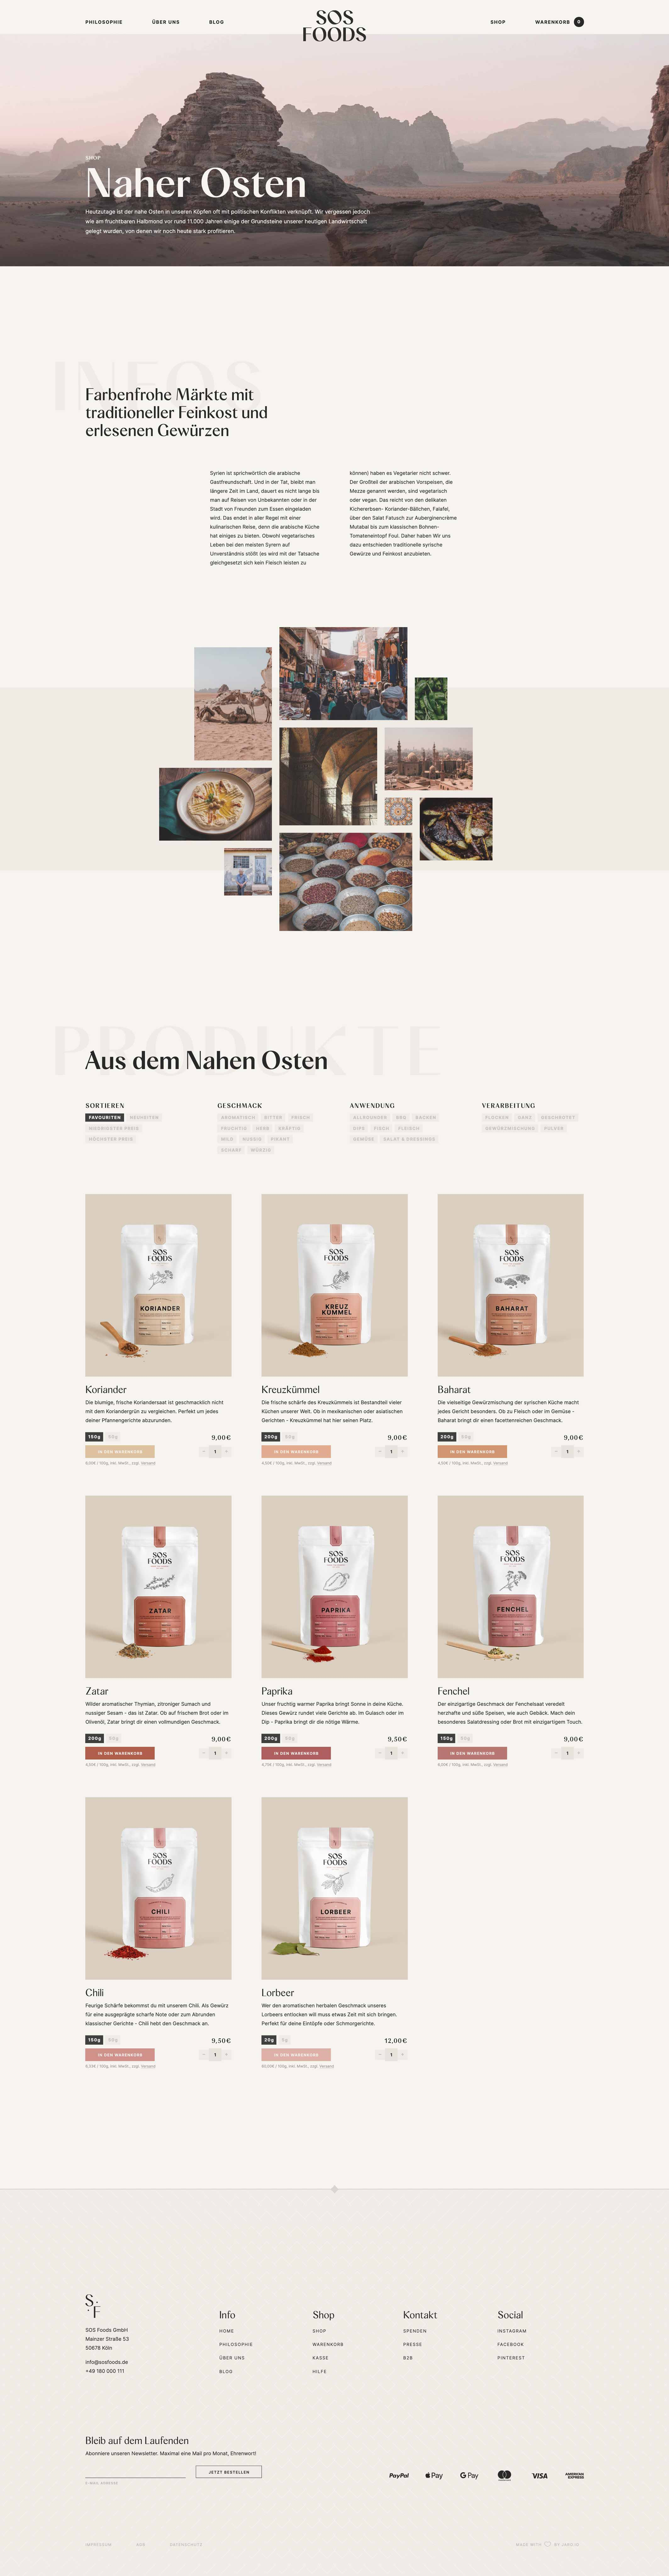 SOS Foods: Webdesign of region page, Middle East, Desktop breakpoint